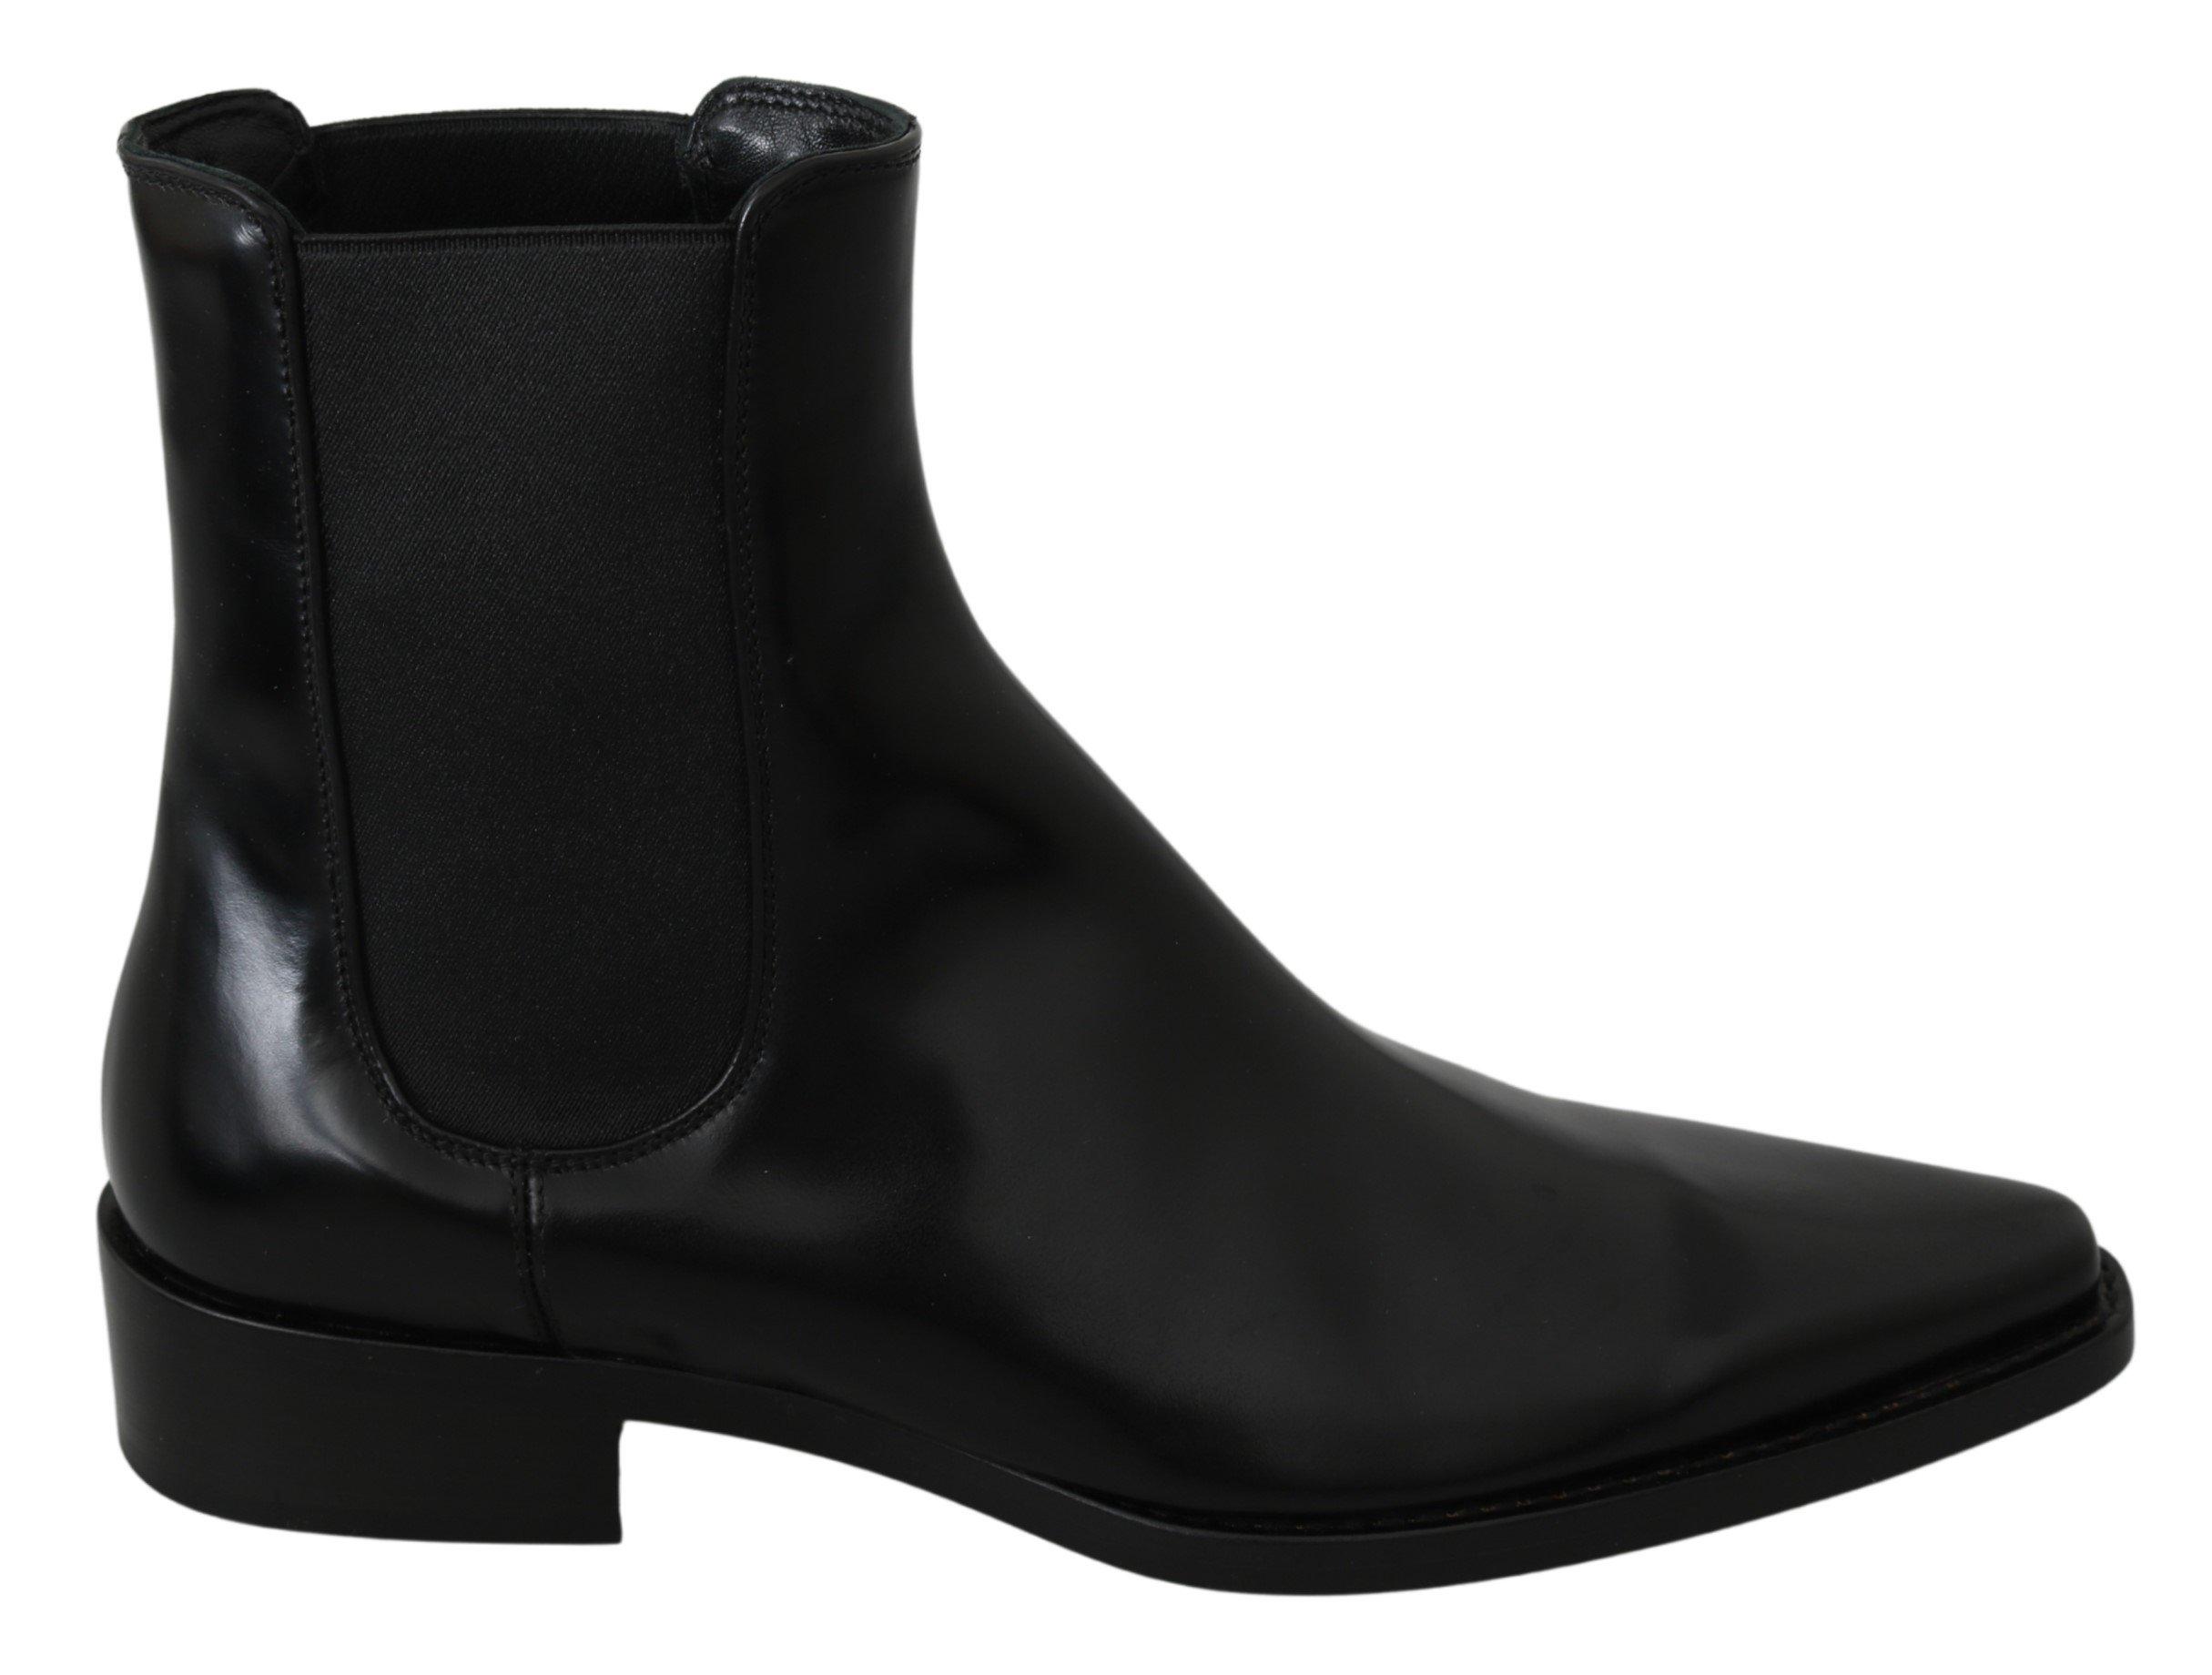 Dolce & Gabbana Women's Flats Pointed Leather Boot Black LA7053 - EU37/US6.5